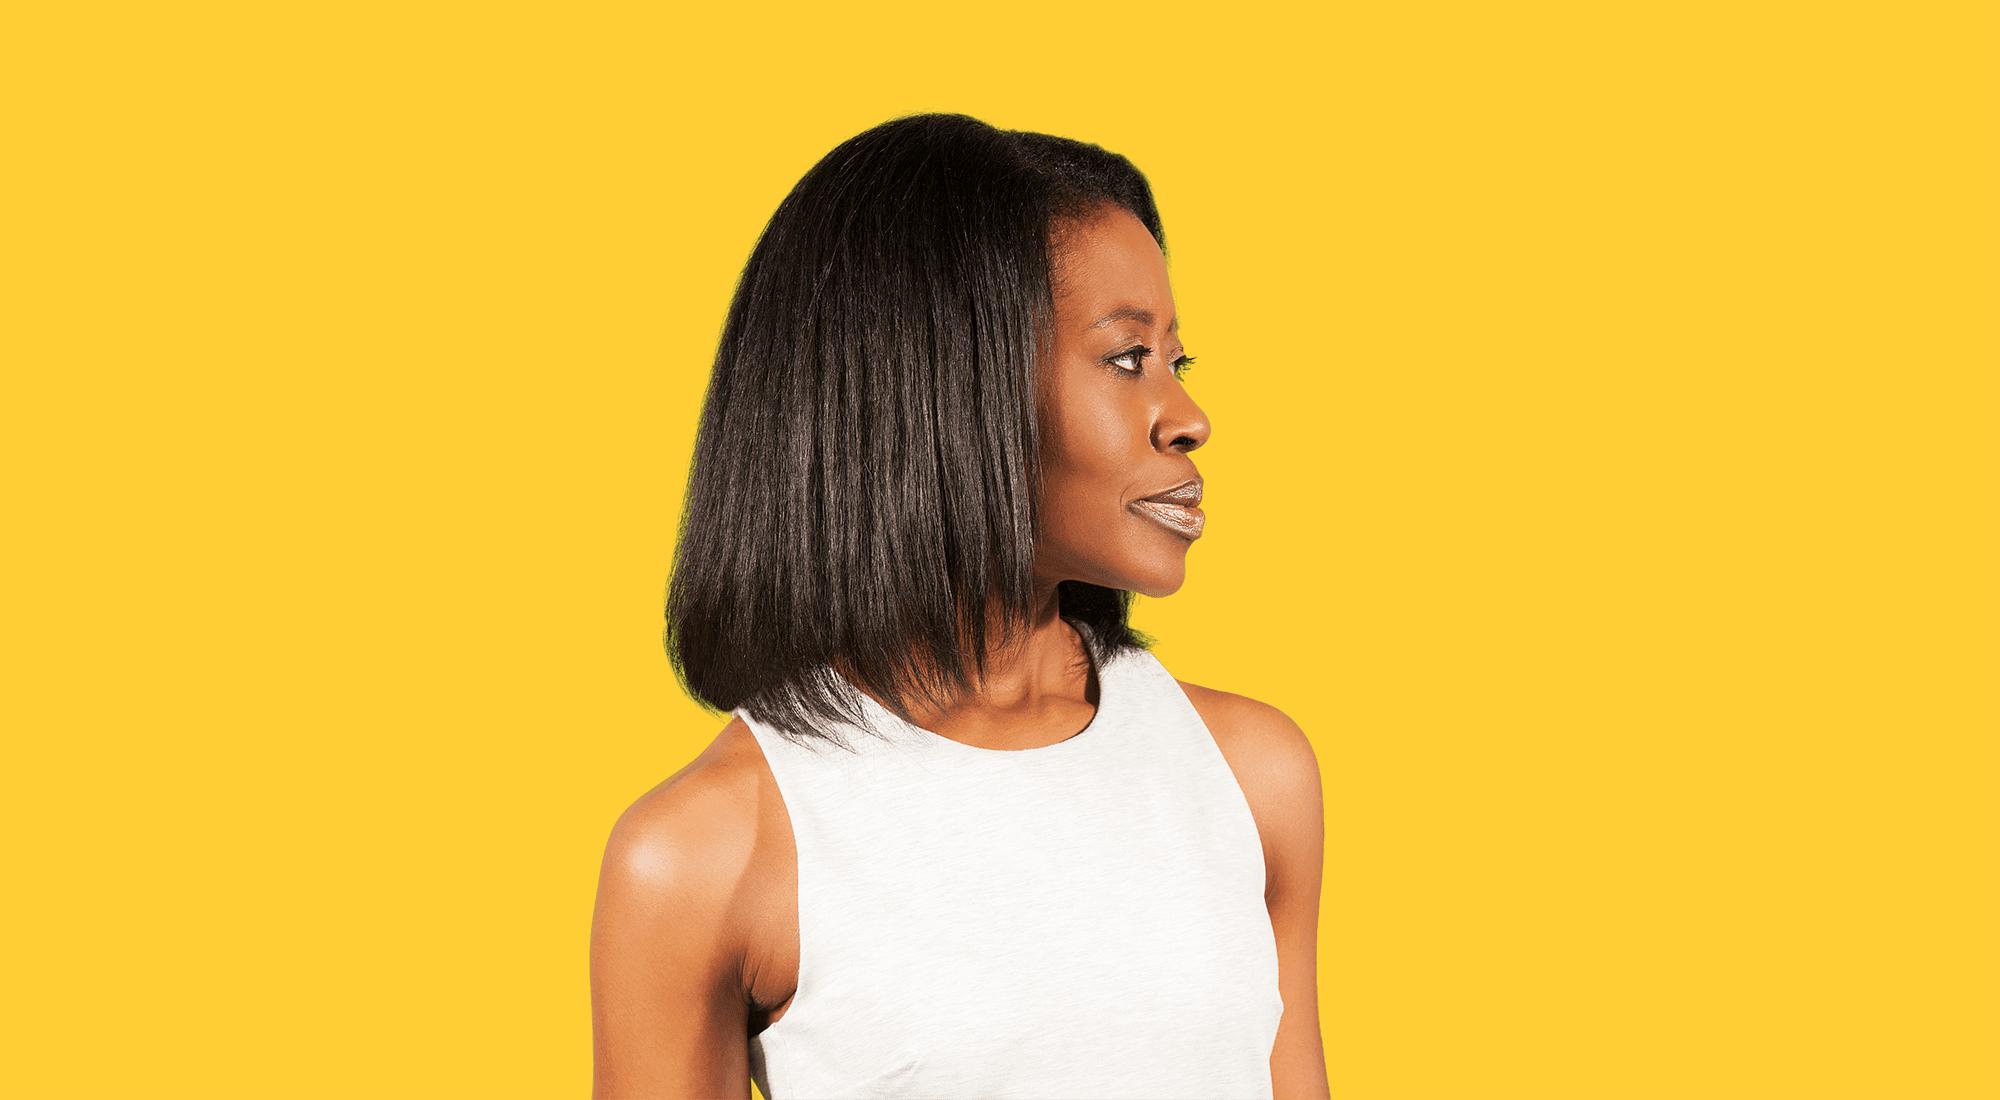 Four women tackling tech's diversity problem